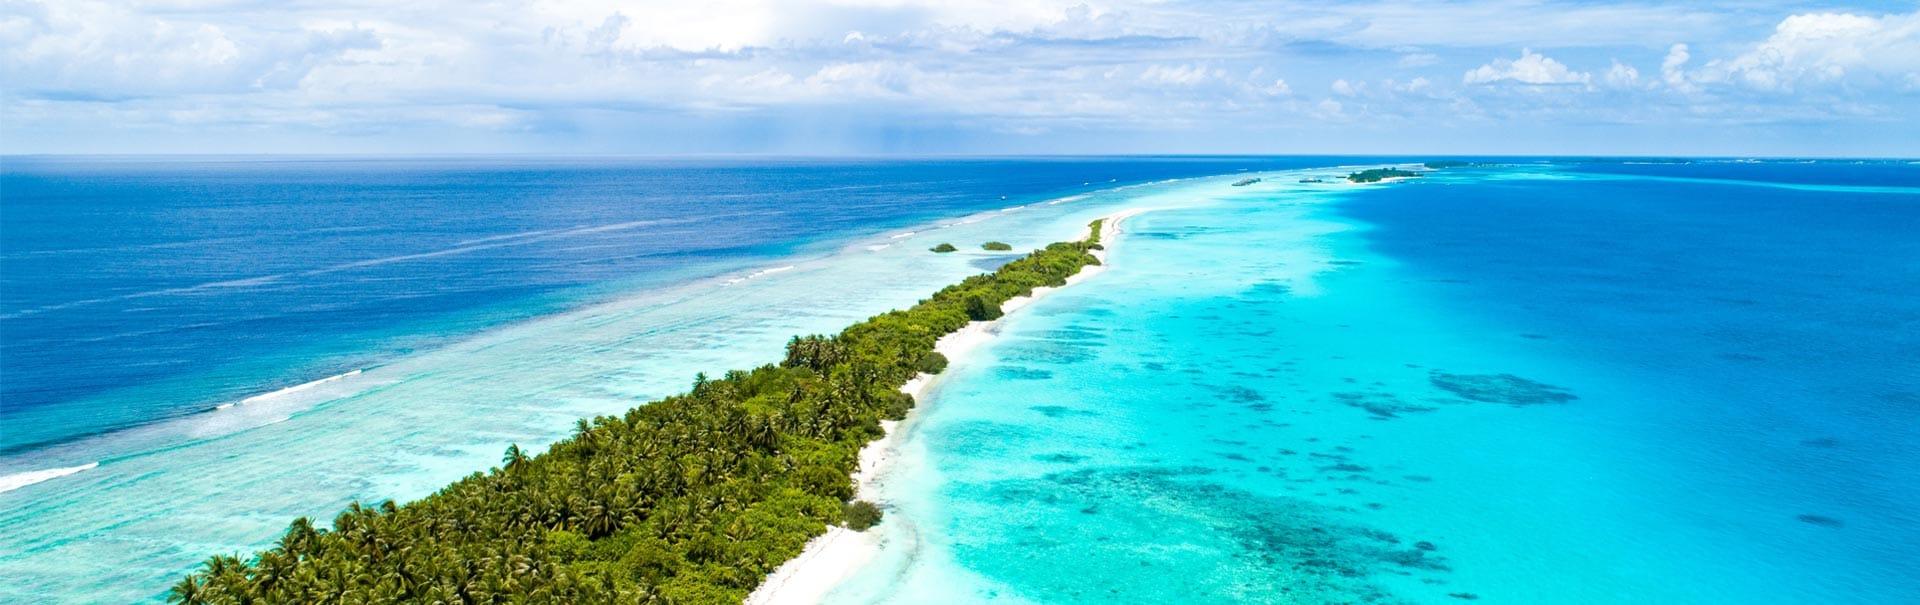 Maldives (ASML) Banner